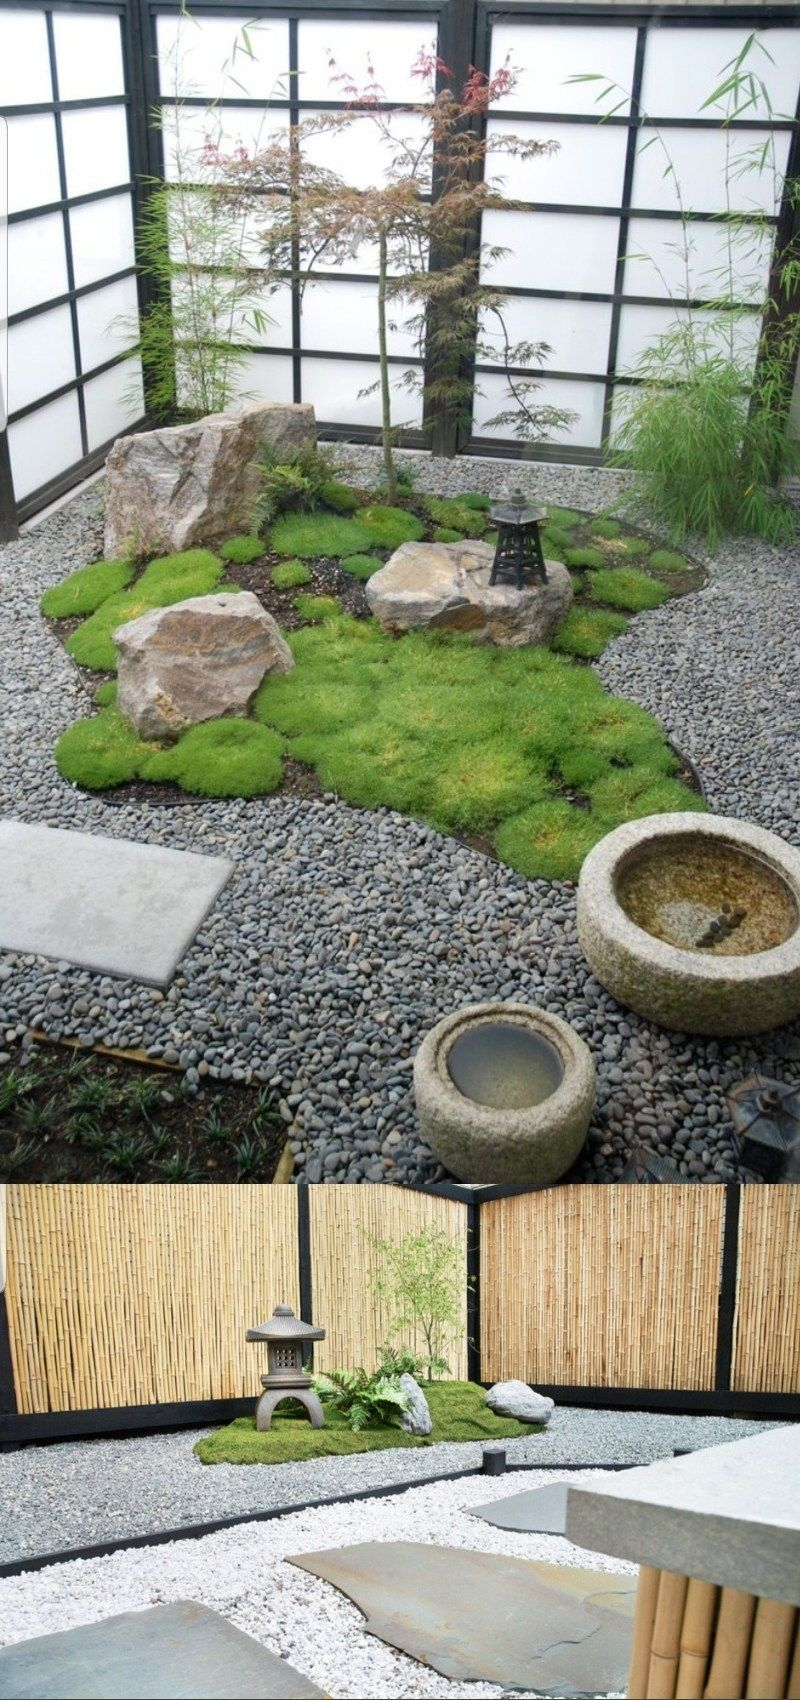 21 Beautiful Zen Garden Ideas 2019 Zengarden Miniature Backyard Diy Landscape Japanese Rock Garden Indoor Zen Garden Small Japanese Garden